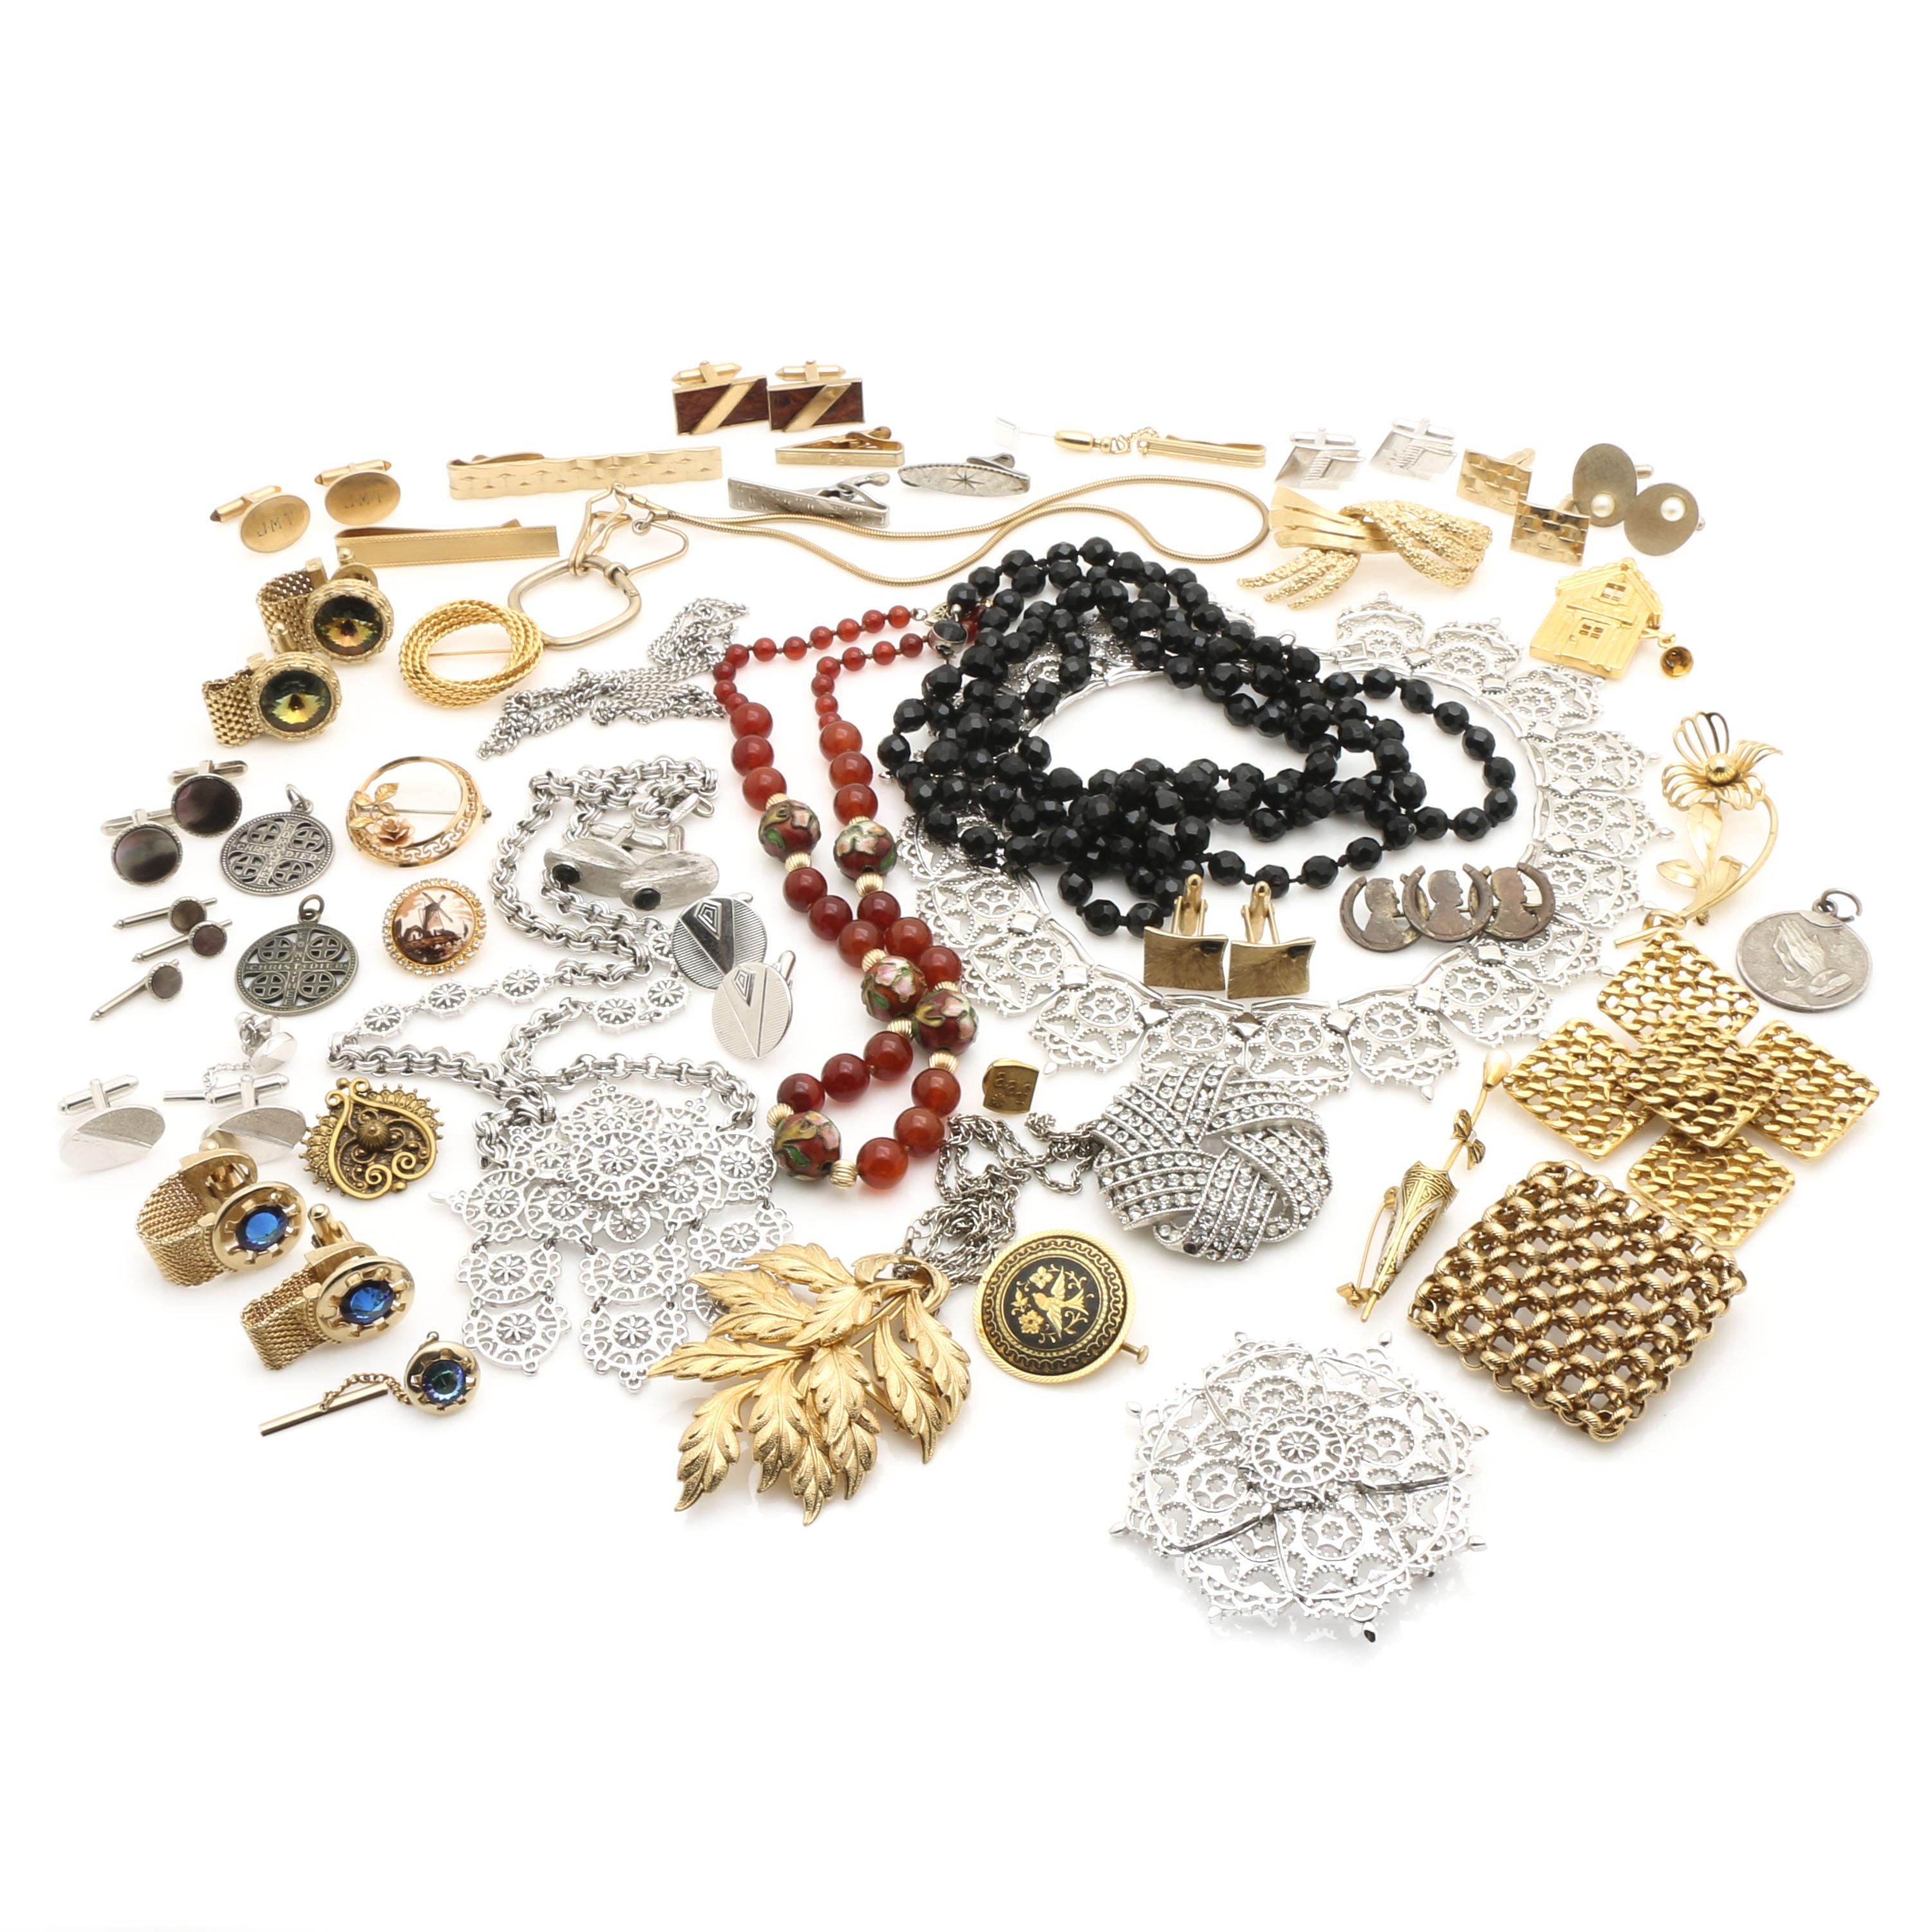 Women's and Men's Costume Jewelry Assortment